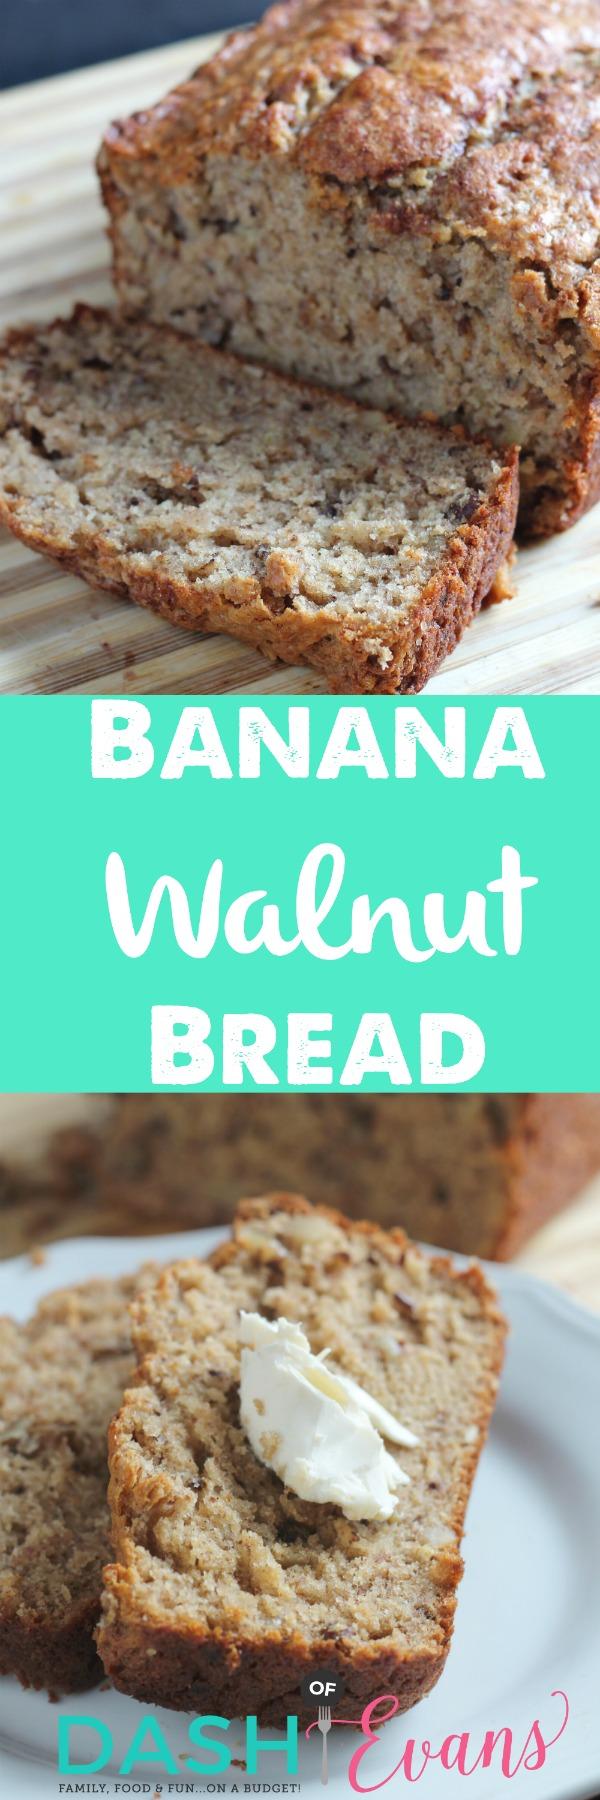 Delish Snack: Banana Walnut Bread with Greek Yogurt. YUM! via @DashOfEvans